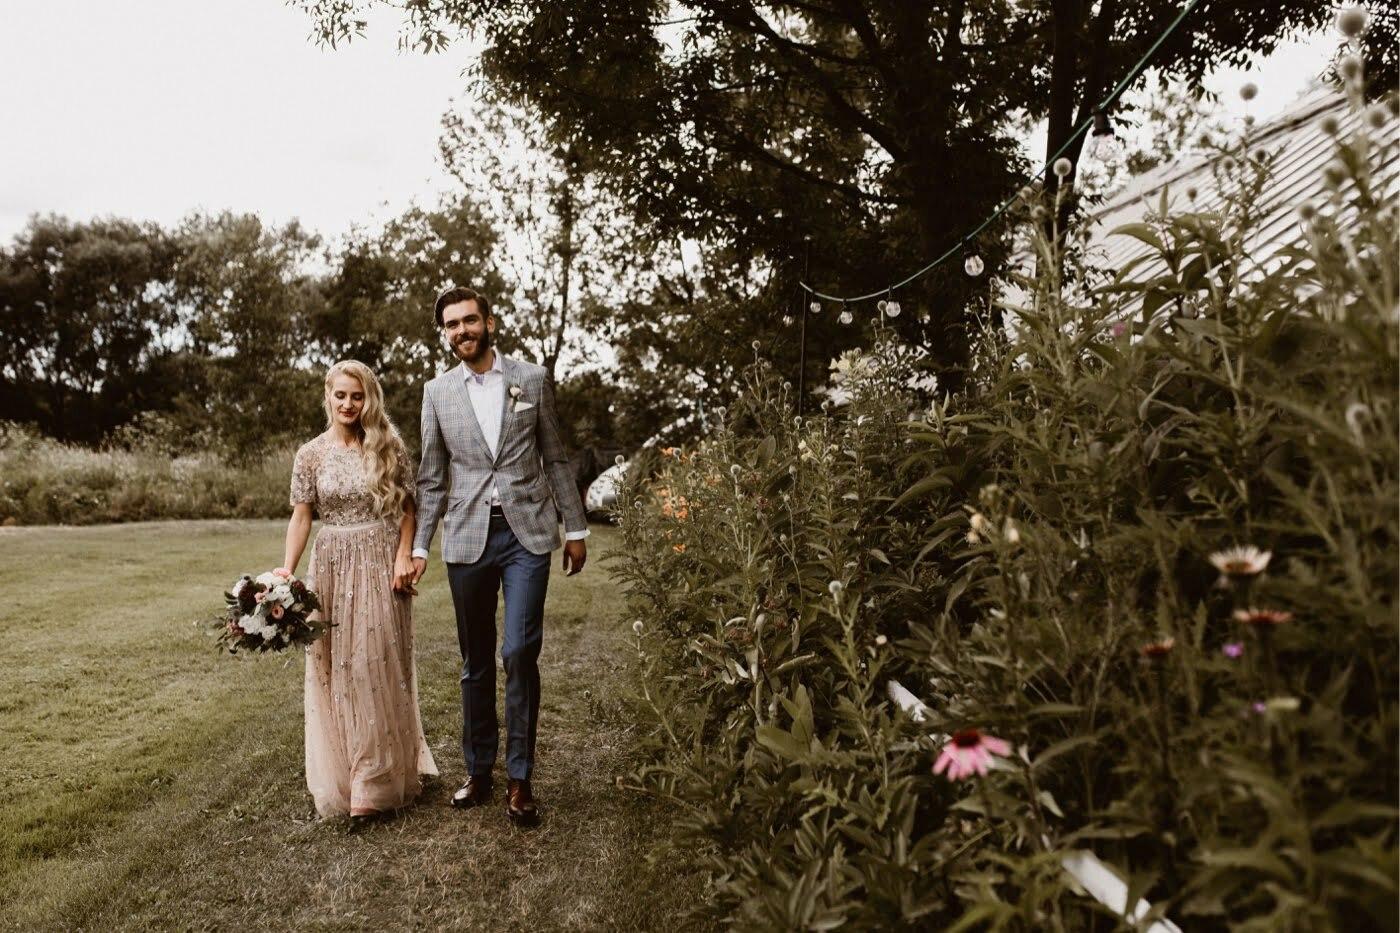 ewelina zieba rustykalne wesele stara oranzeria warszawa 033